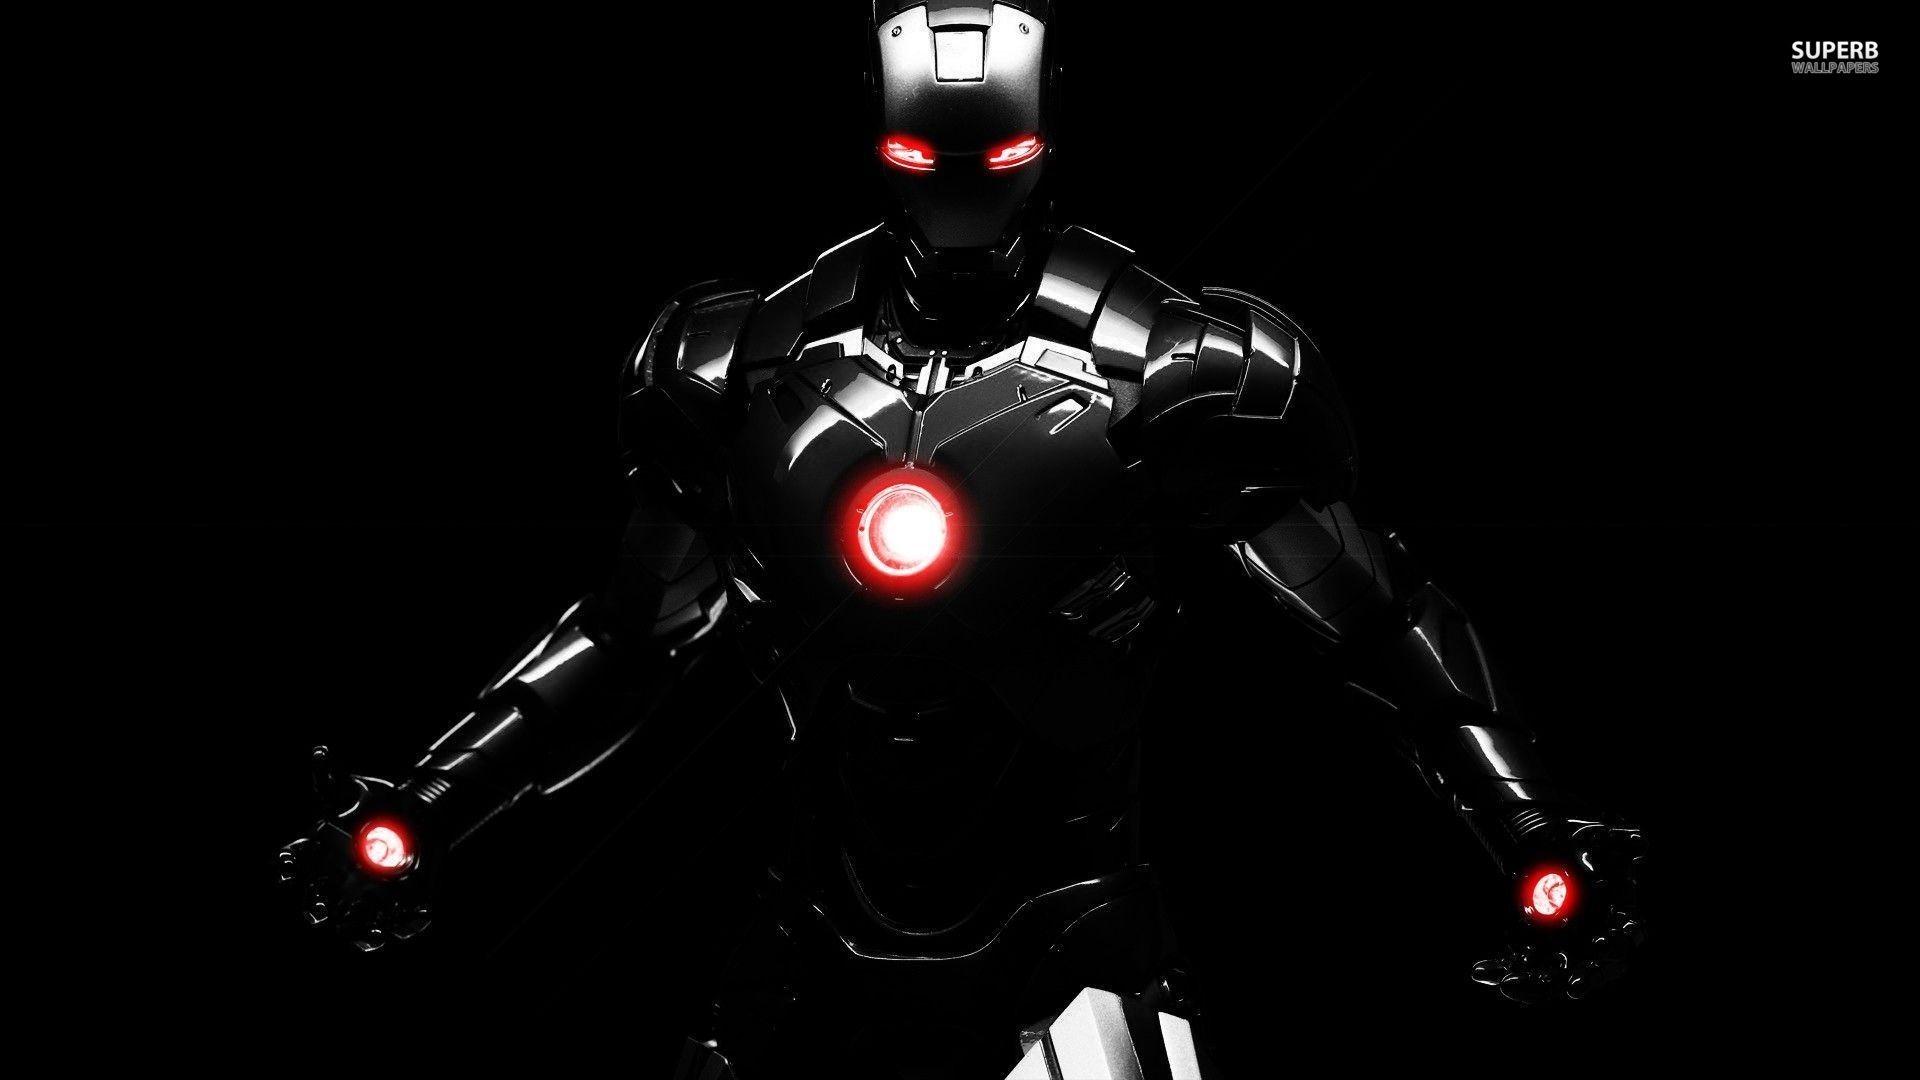 25 Cool Iron Man Wallpapers HD – MixHD wallpapers